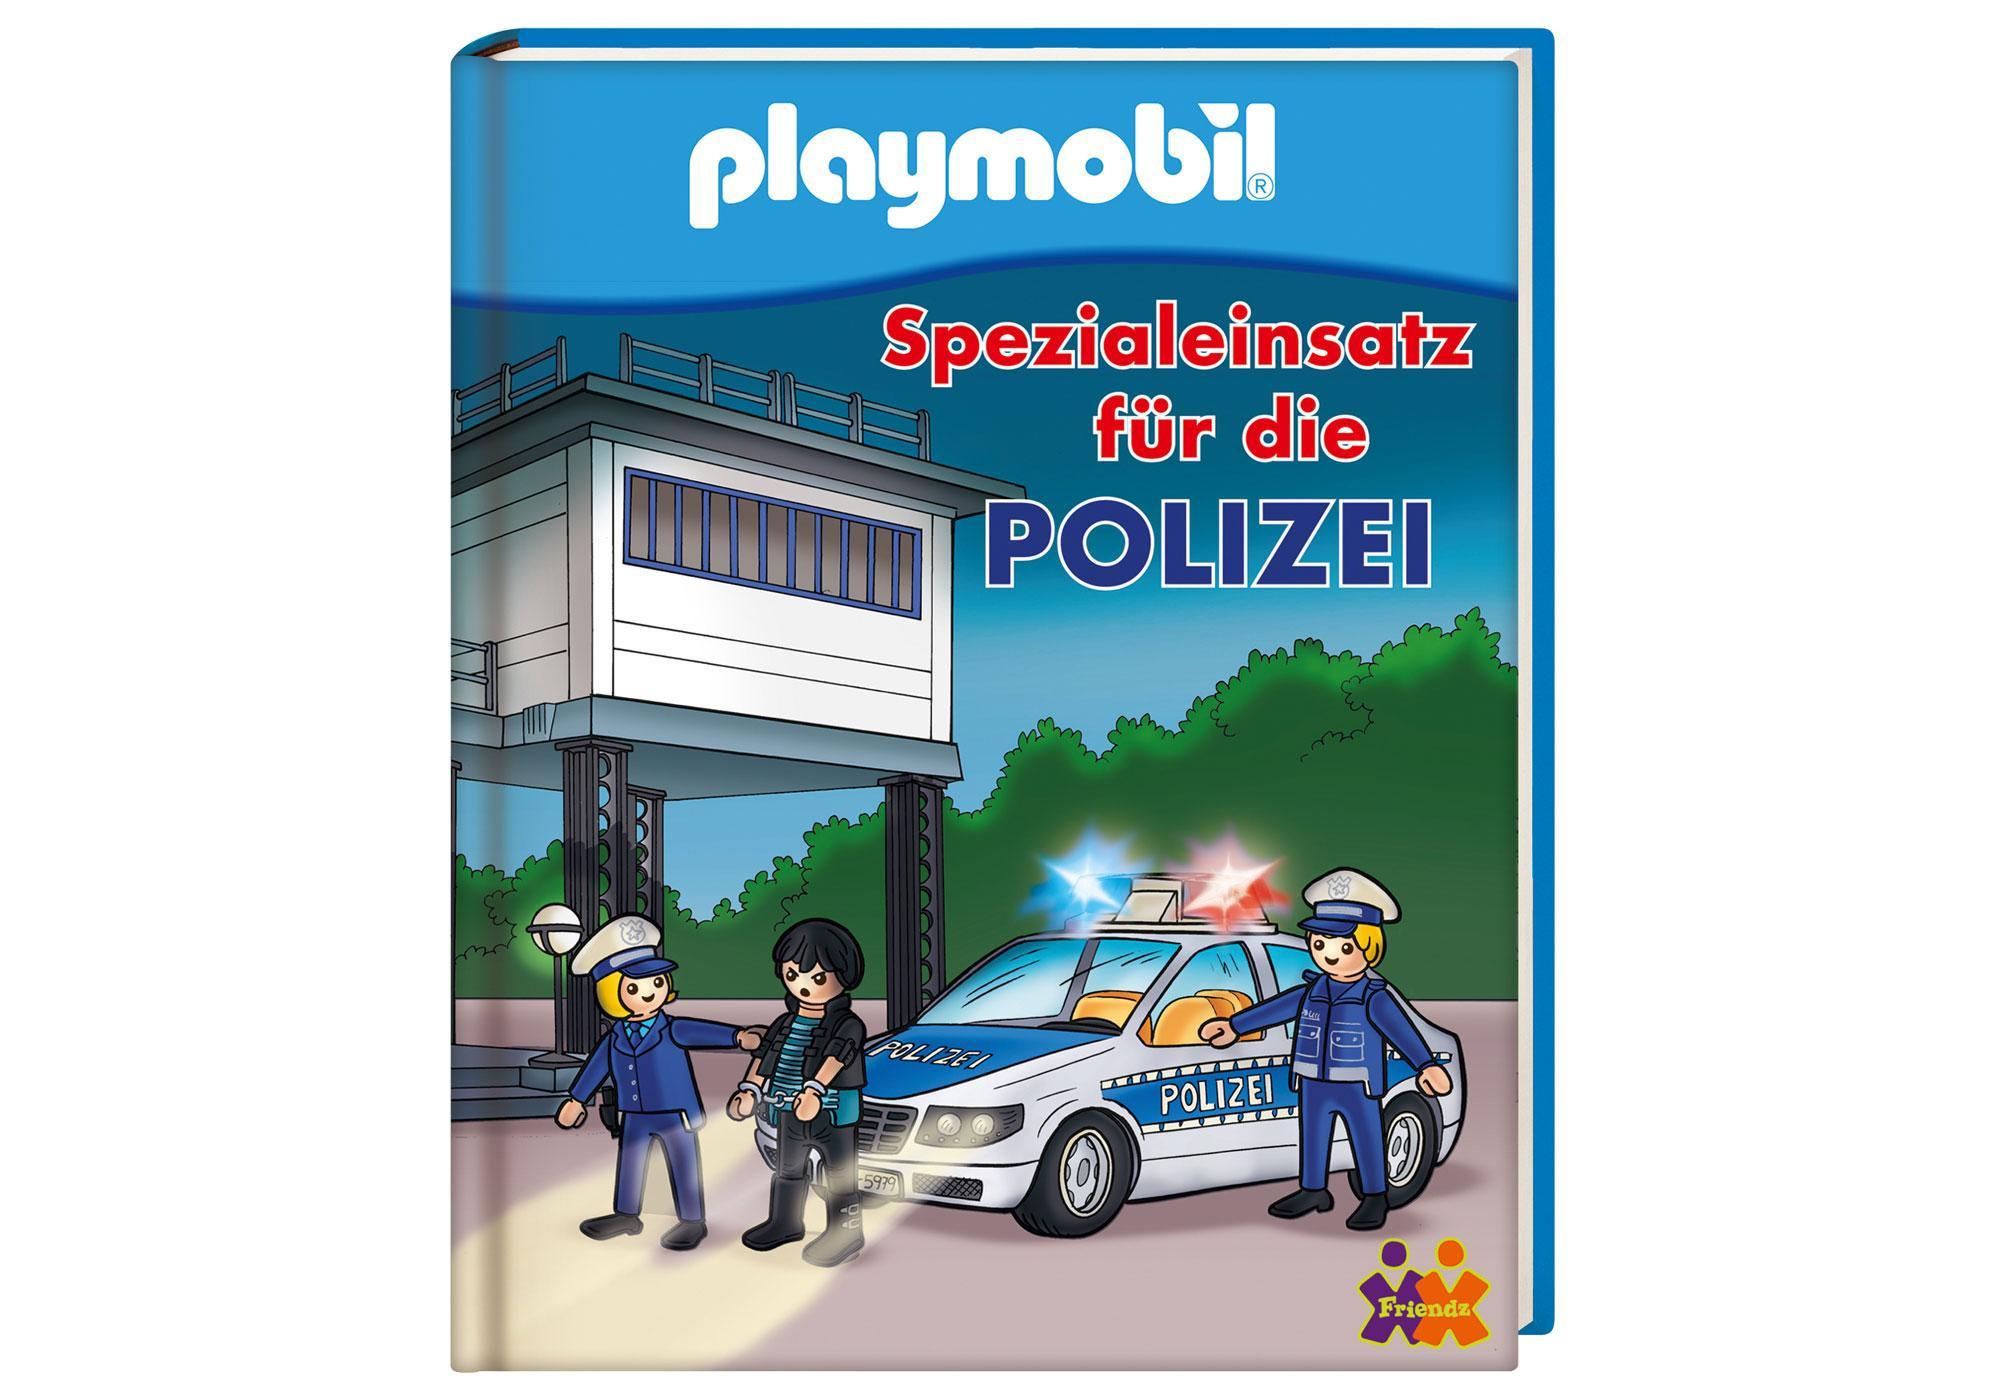 http://media.playmobil.com/i/playmobil/80090_product_detail